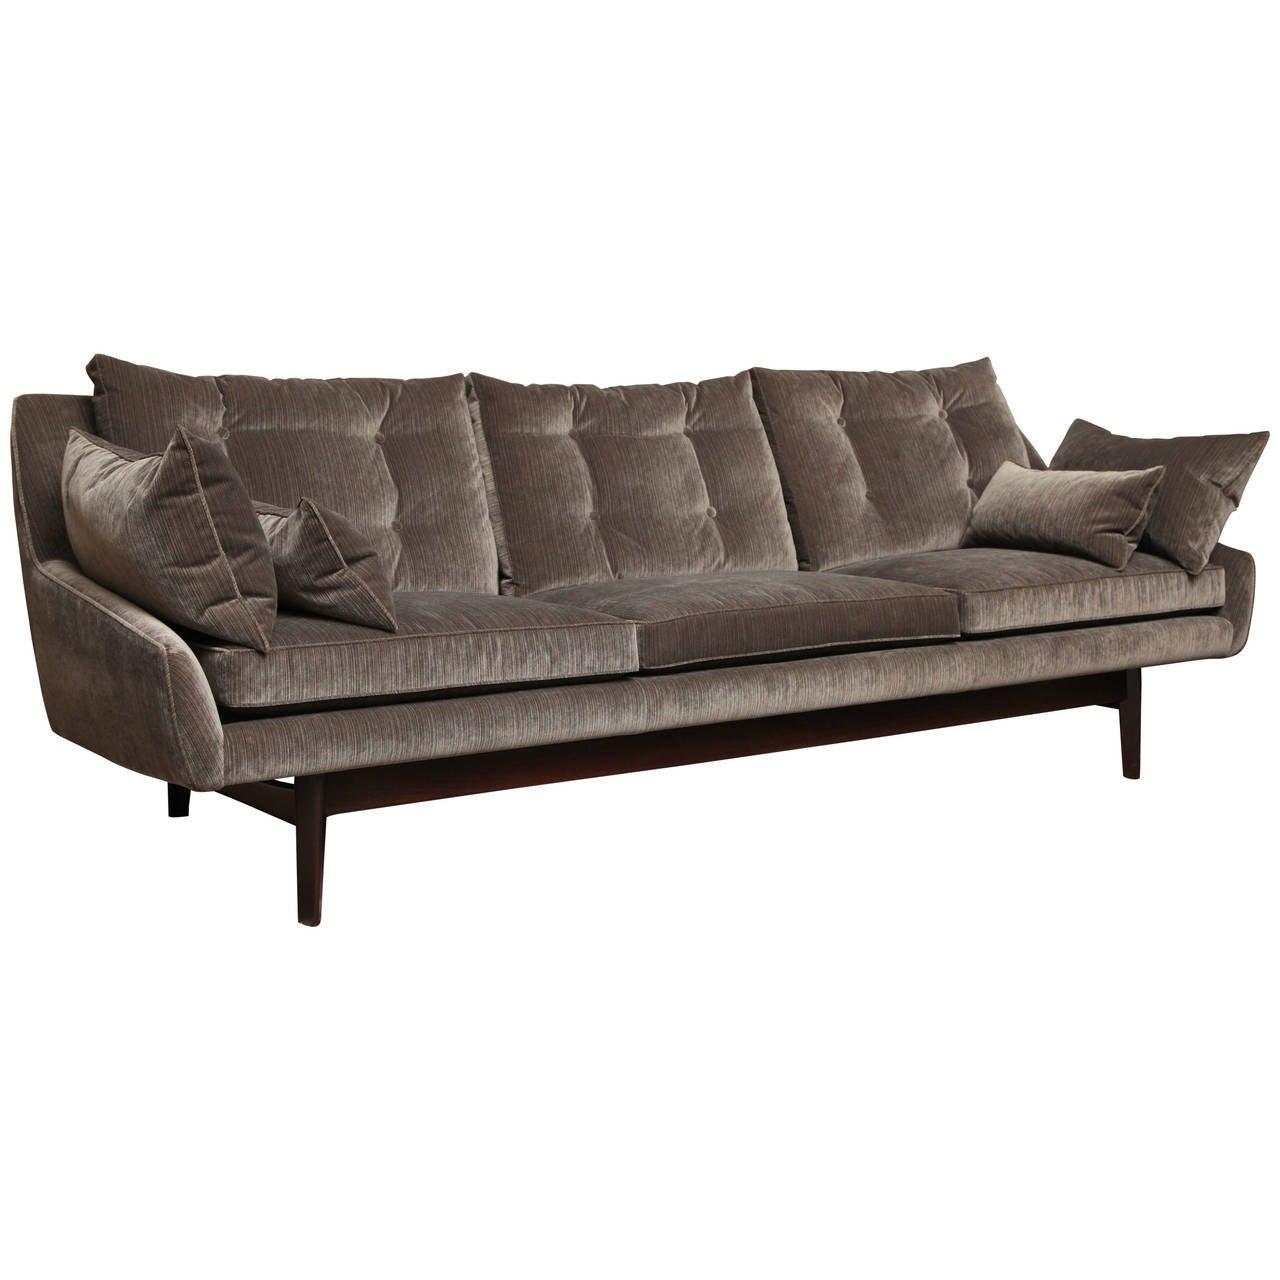 Tufted swedish sofa at 1stdibs for Swedish sofa